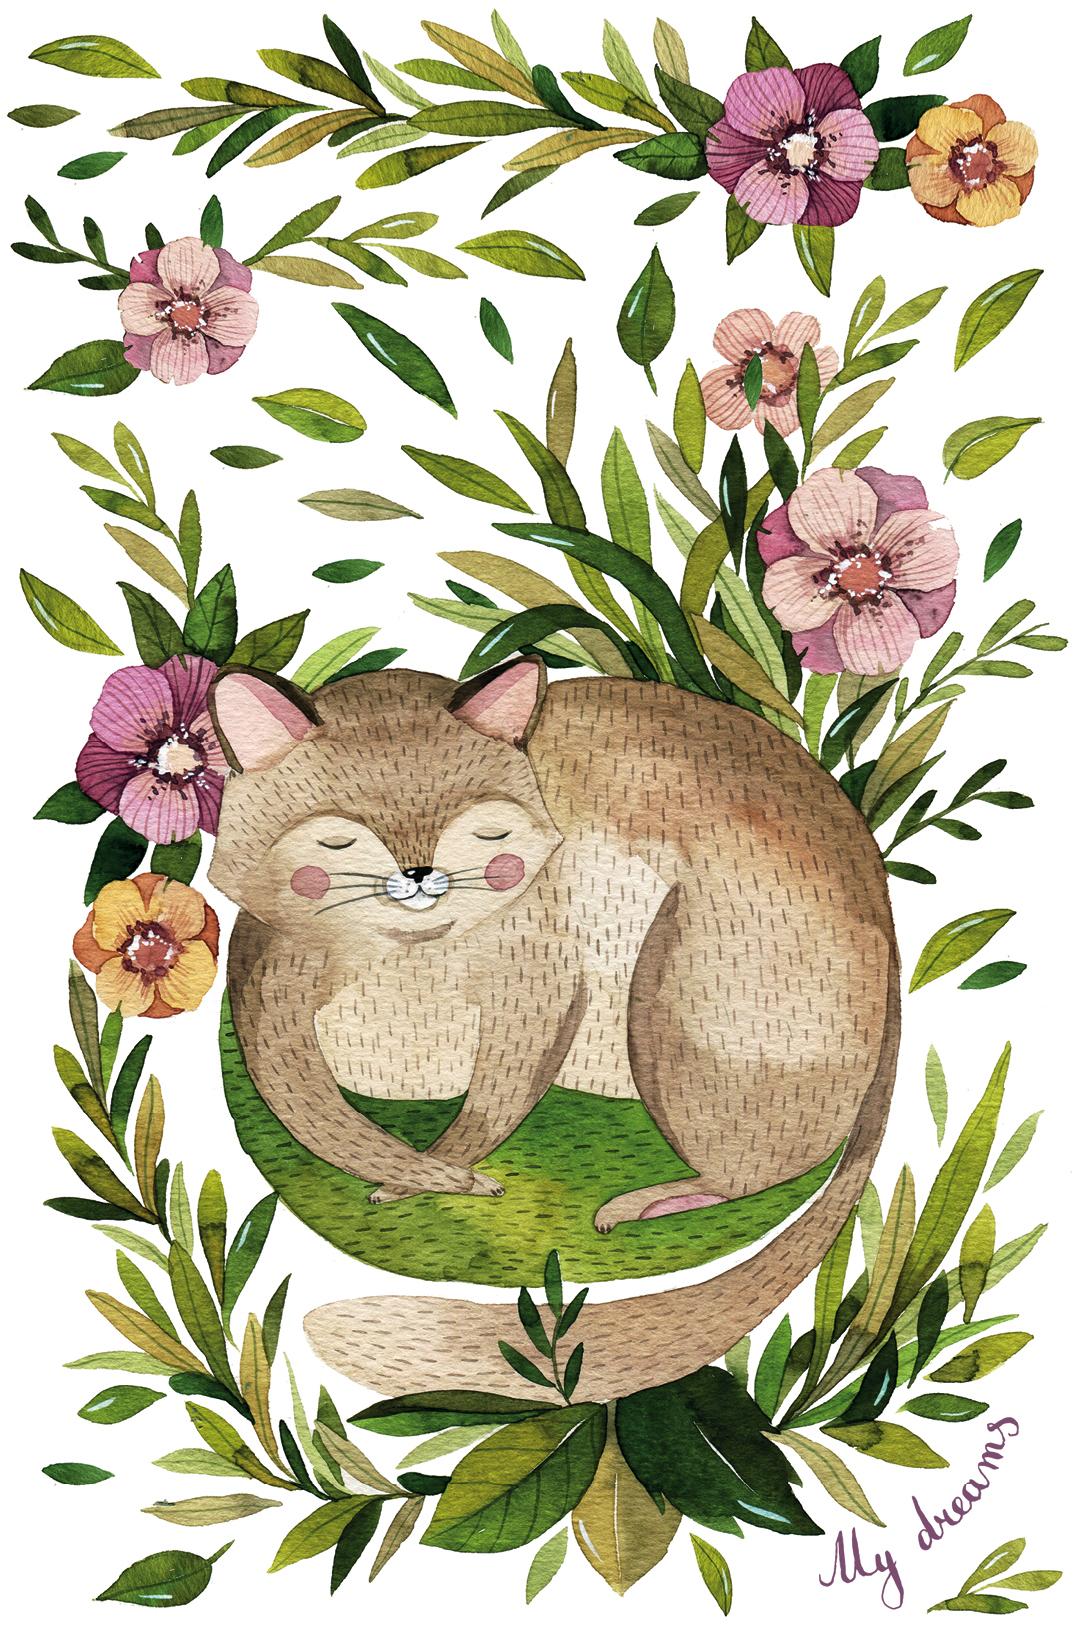 My dreams. Котик. Романтичный блокнот от Vicky_Od